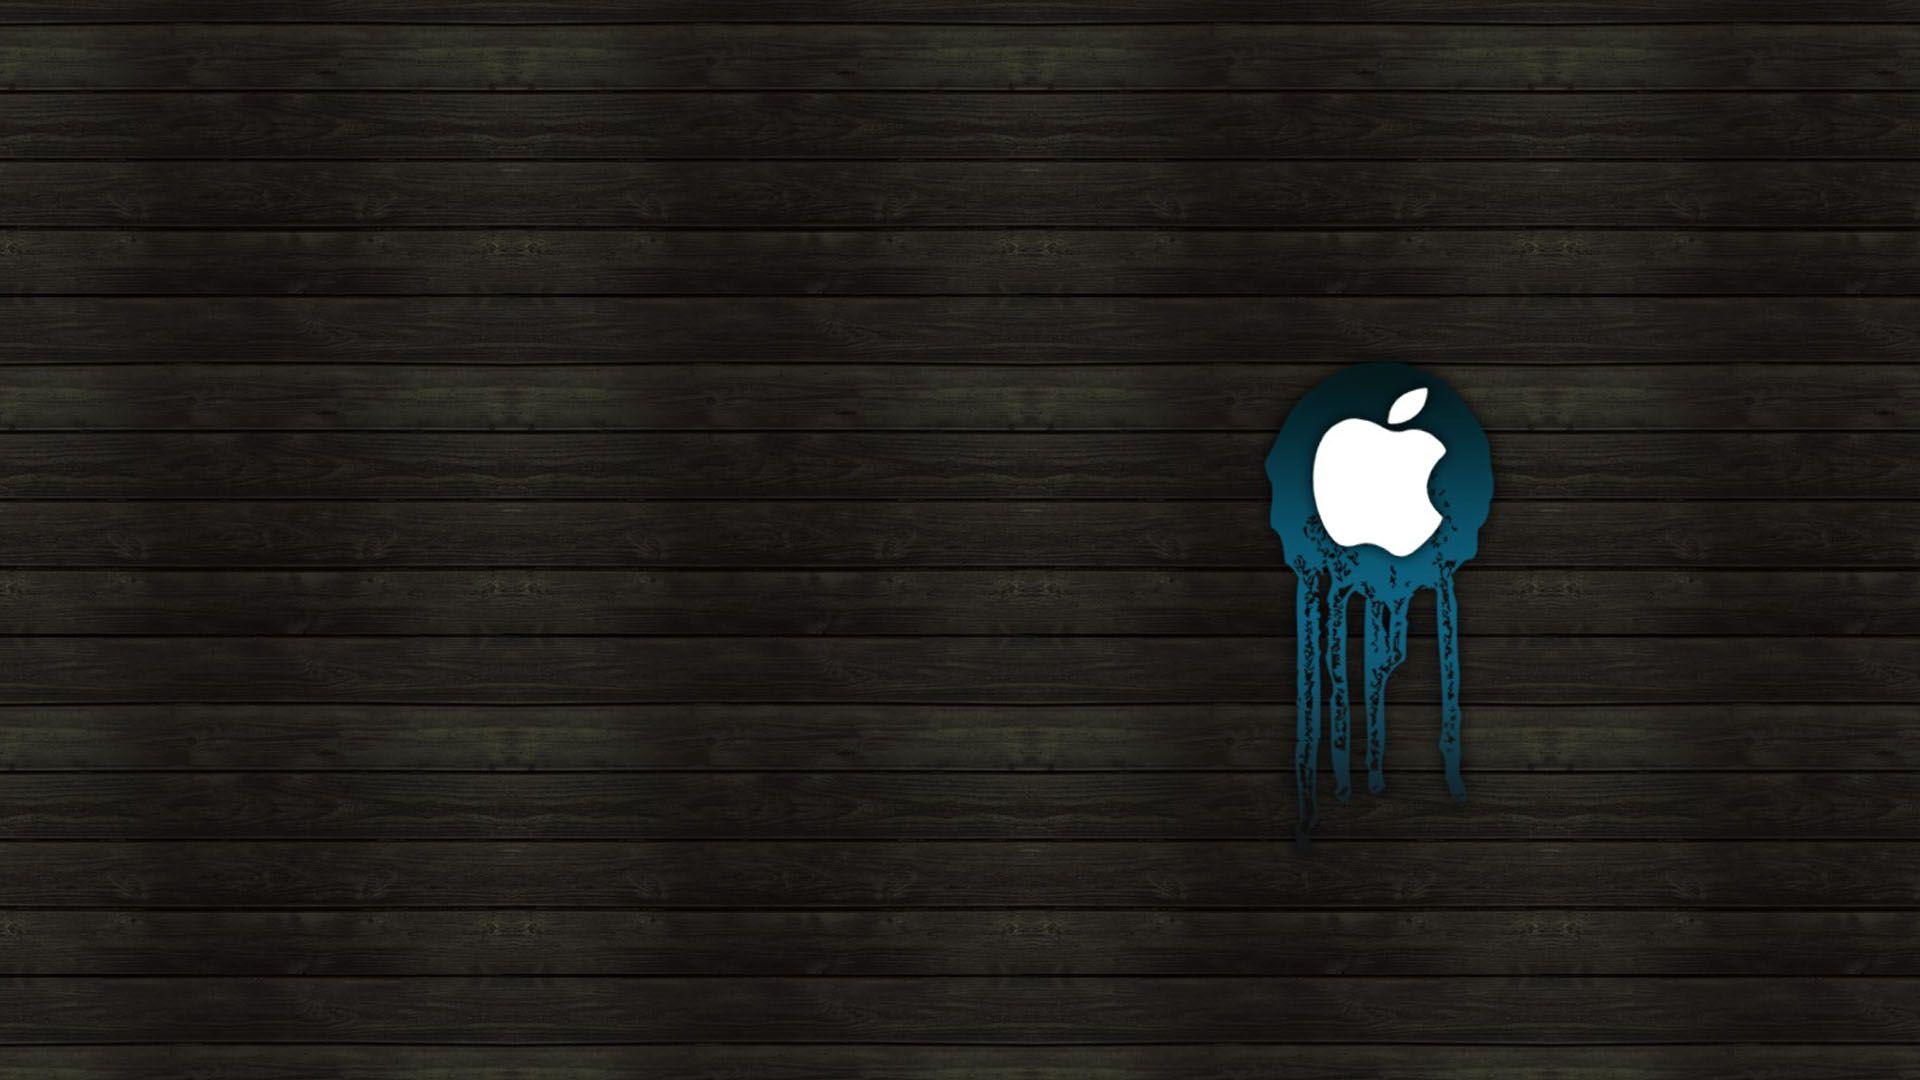 Hd Macbook Air Logo Wallpapers Mac 1920x1080 Download Hd Wallpaper Wallpapertip